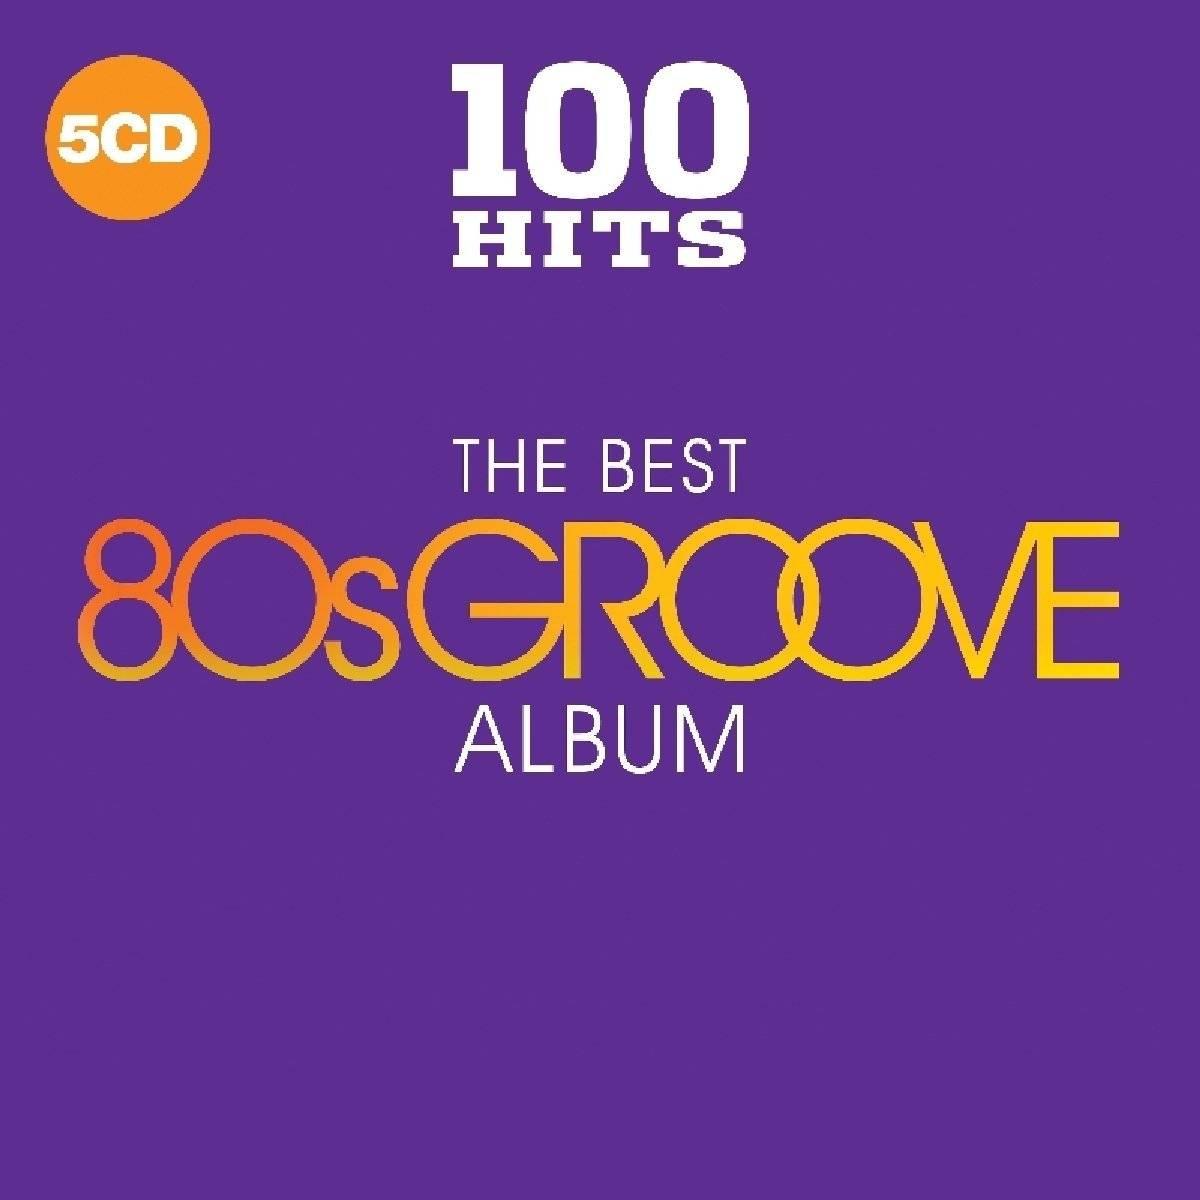 VA - 100 Hits The Best 80s Groove Album (5CD, 2018)